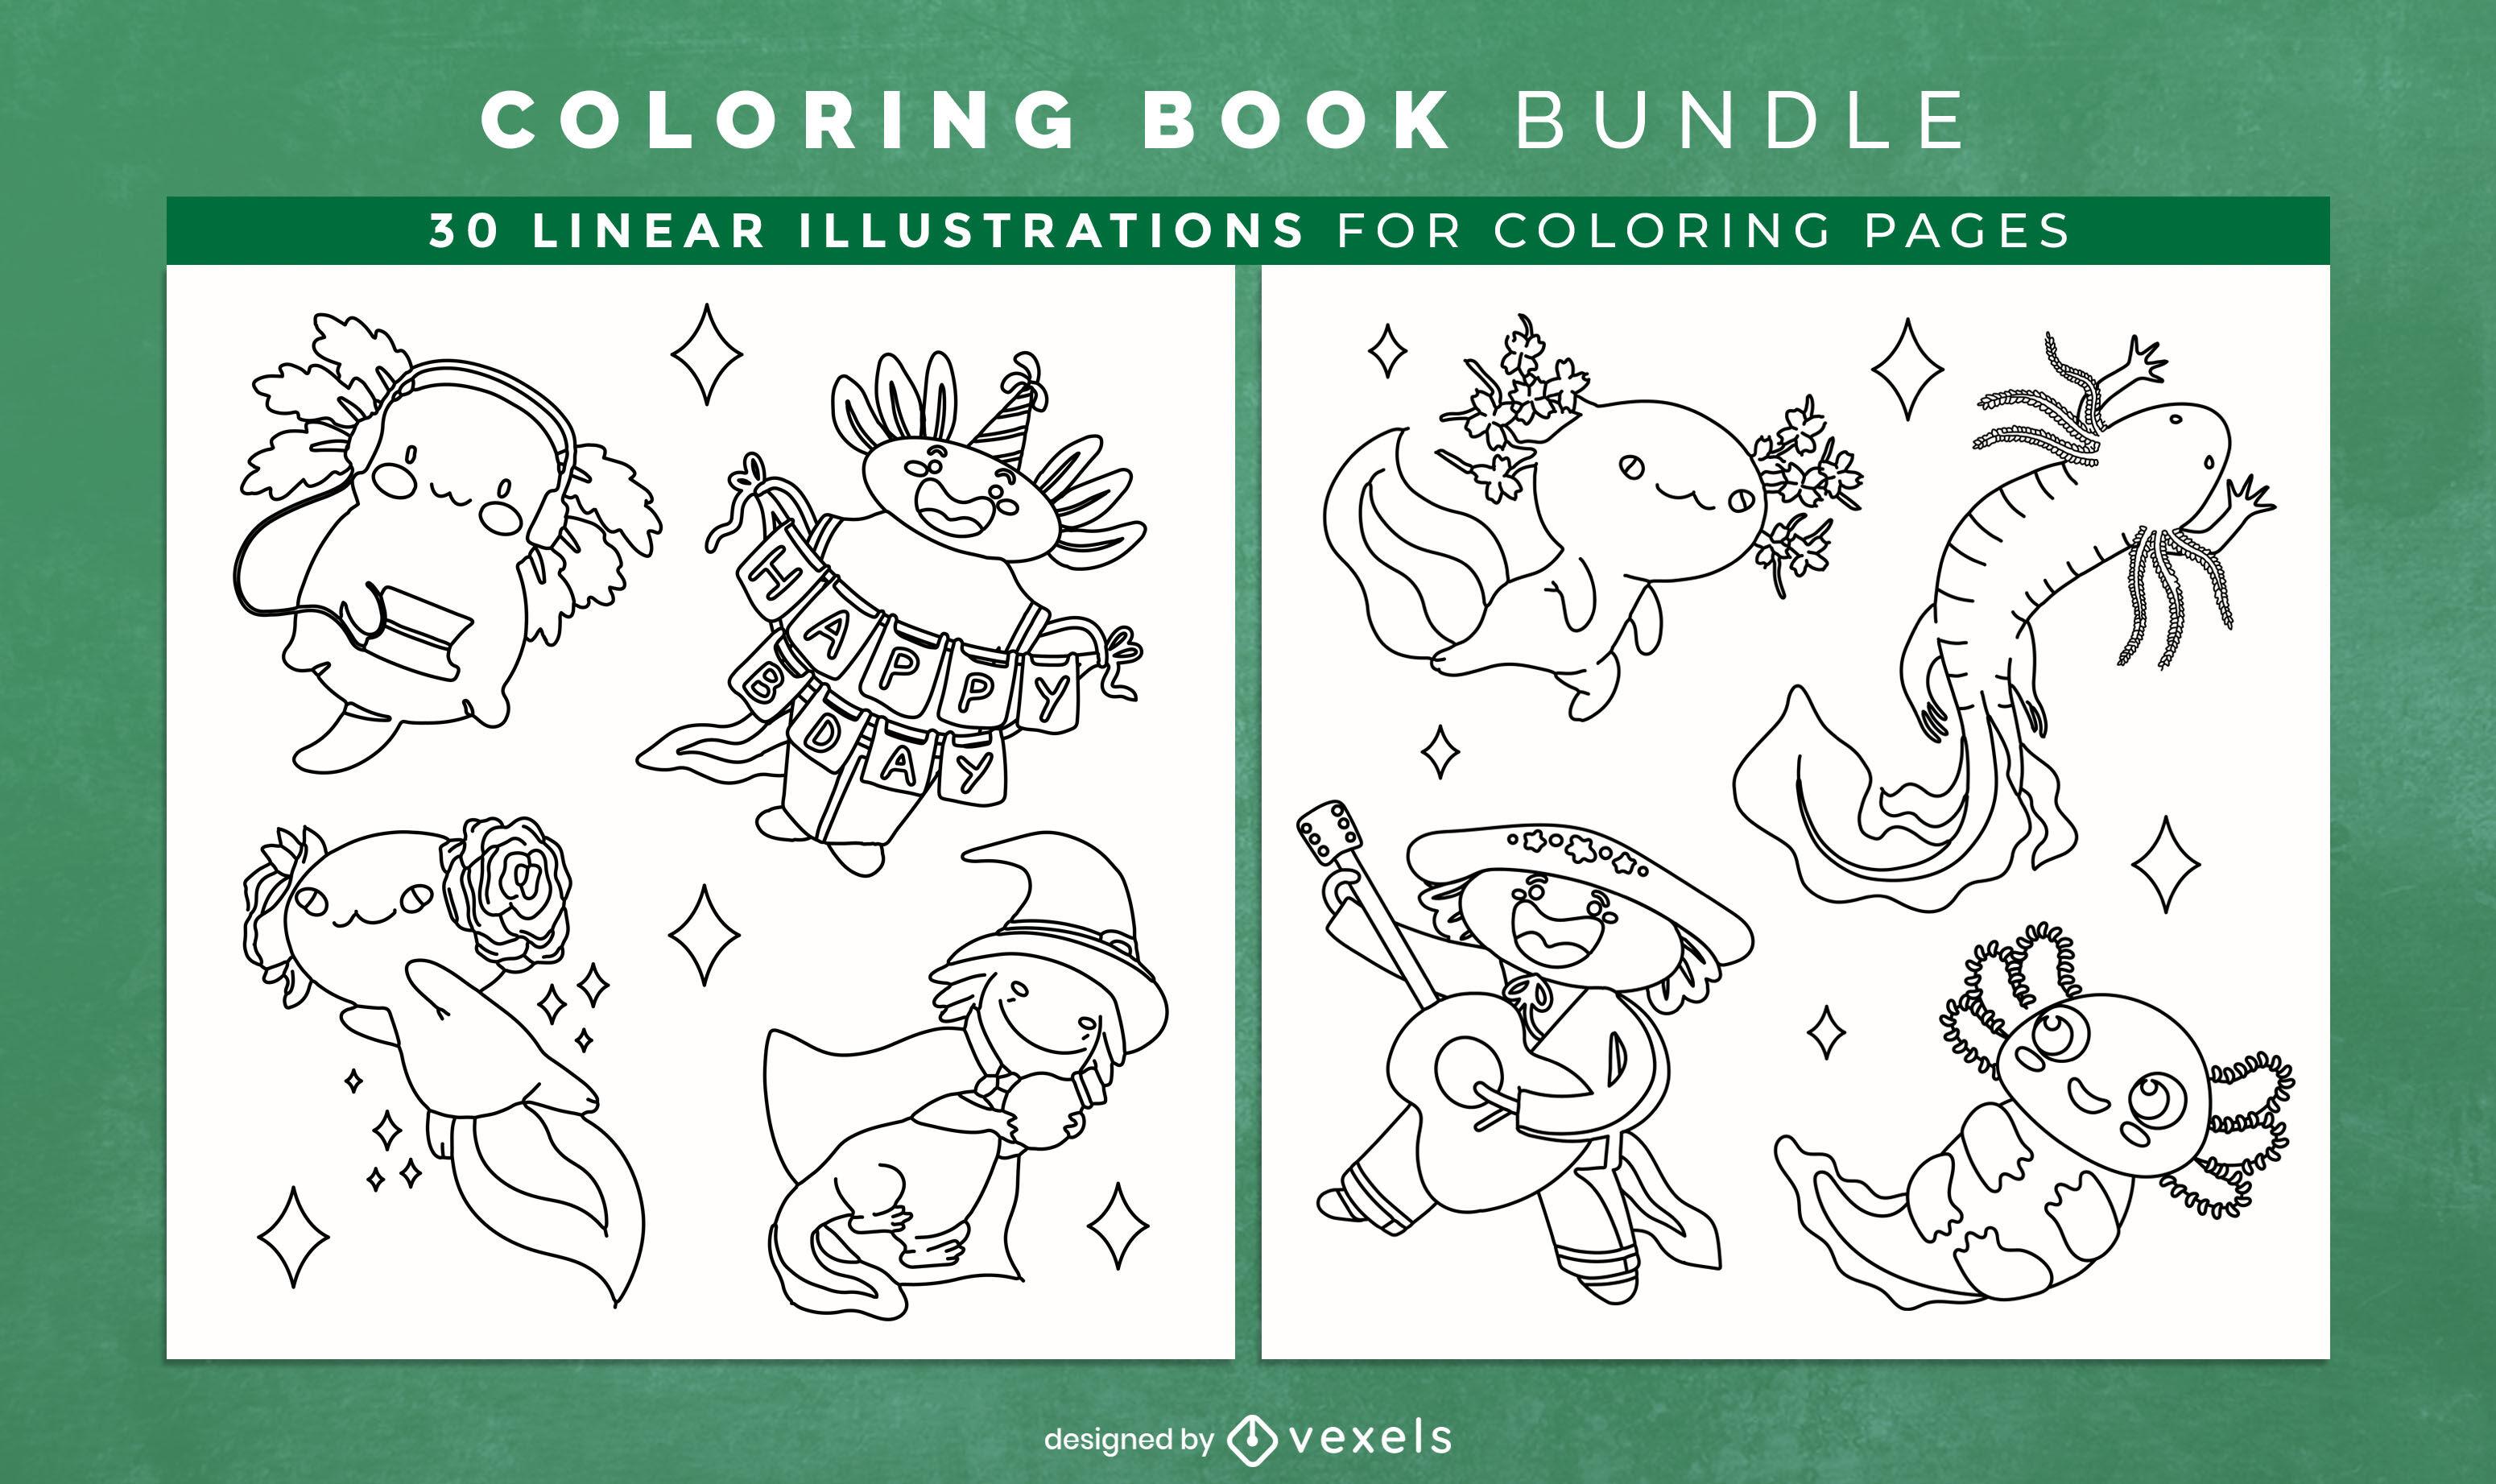 Axolotl animal coloring book design pages